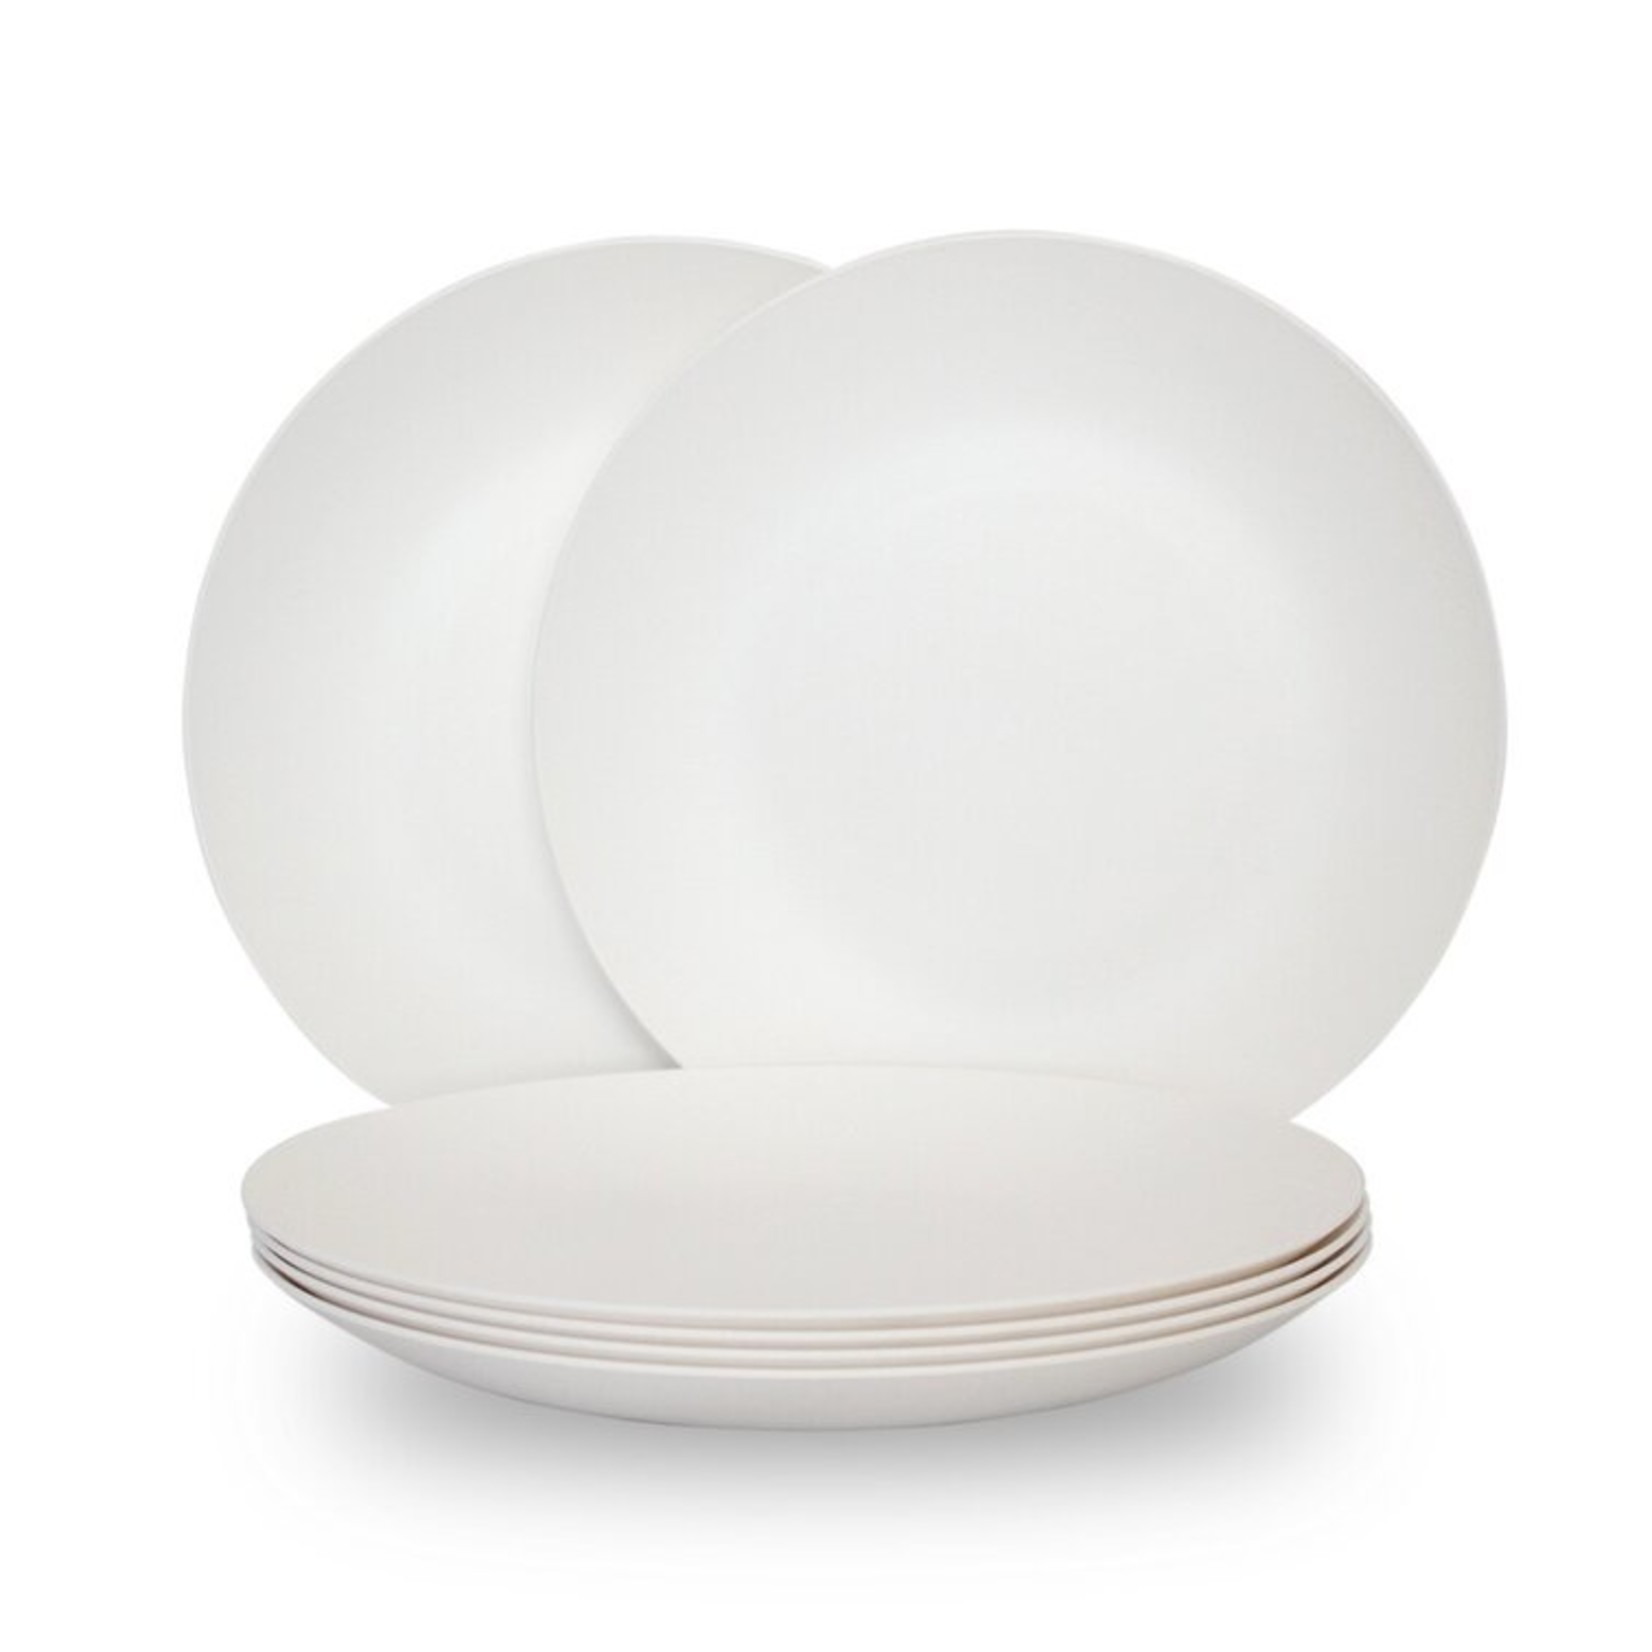 "*Aatto 10"" Melamine Dinner Plate Set of 6"